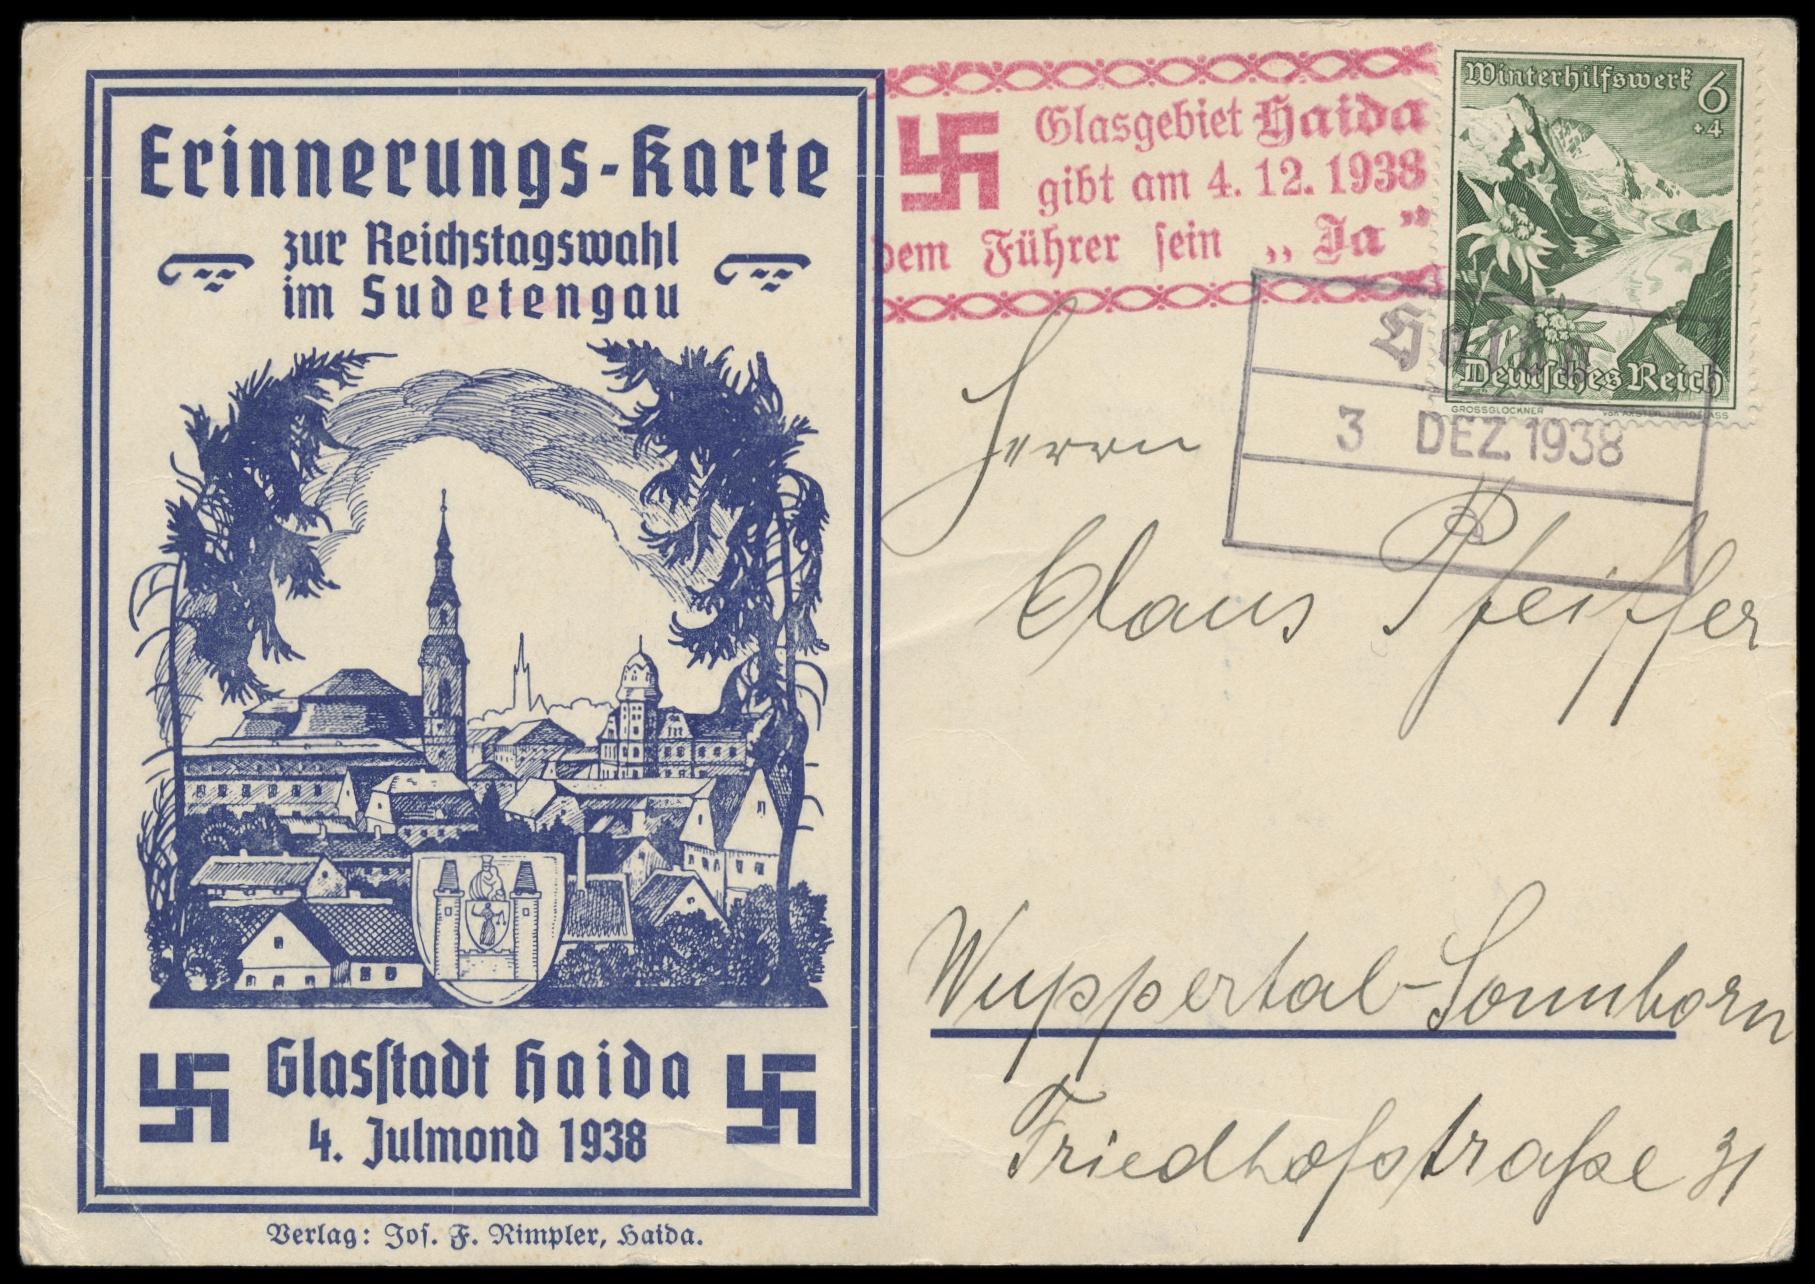 Lot 2583 - Main catalogue sudetenland -  Peter Harlos Auctions 42. Harlos Auktion